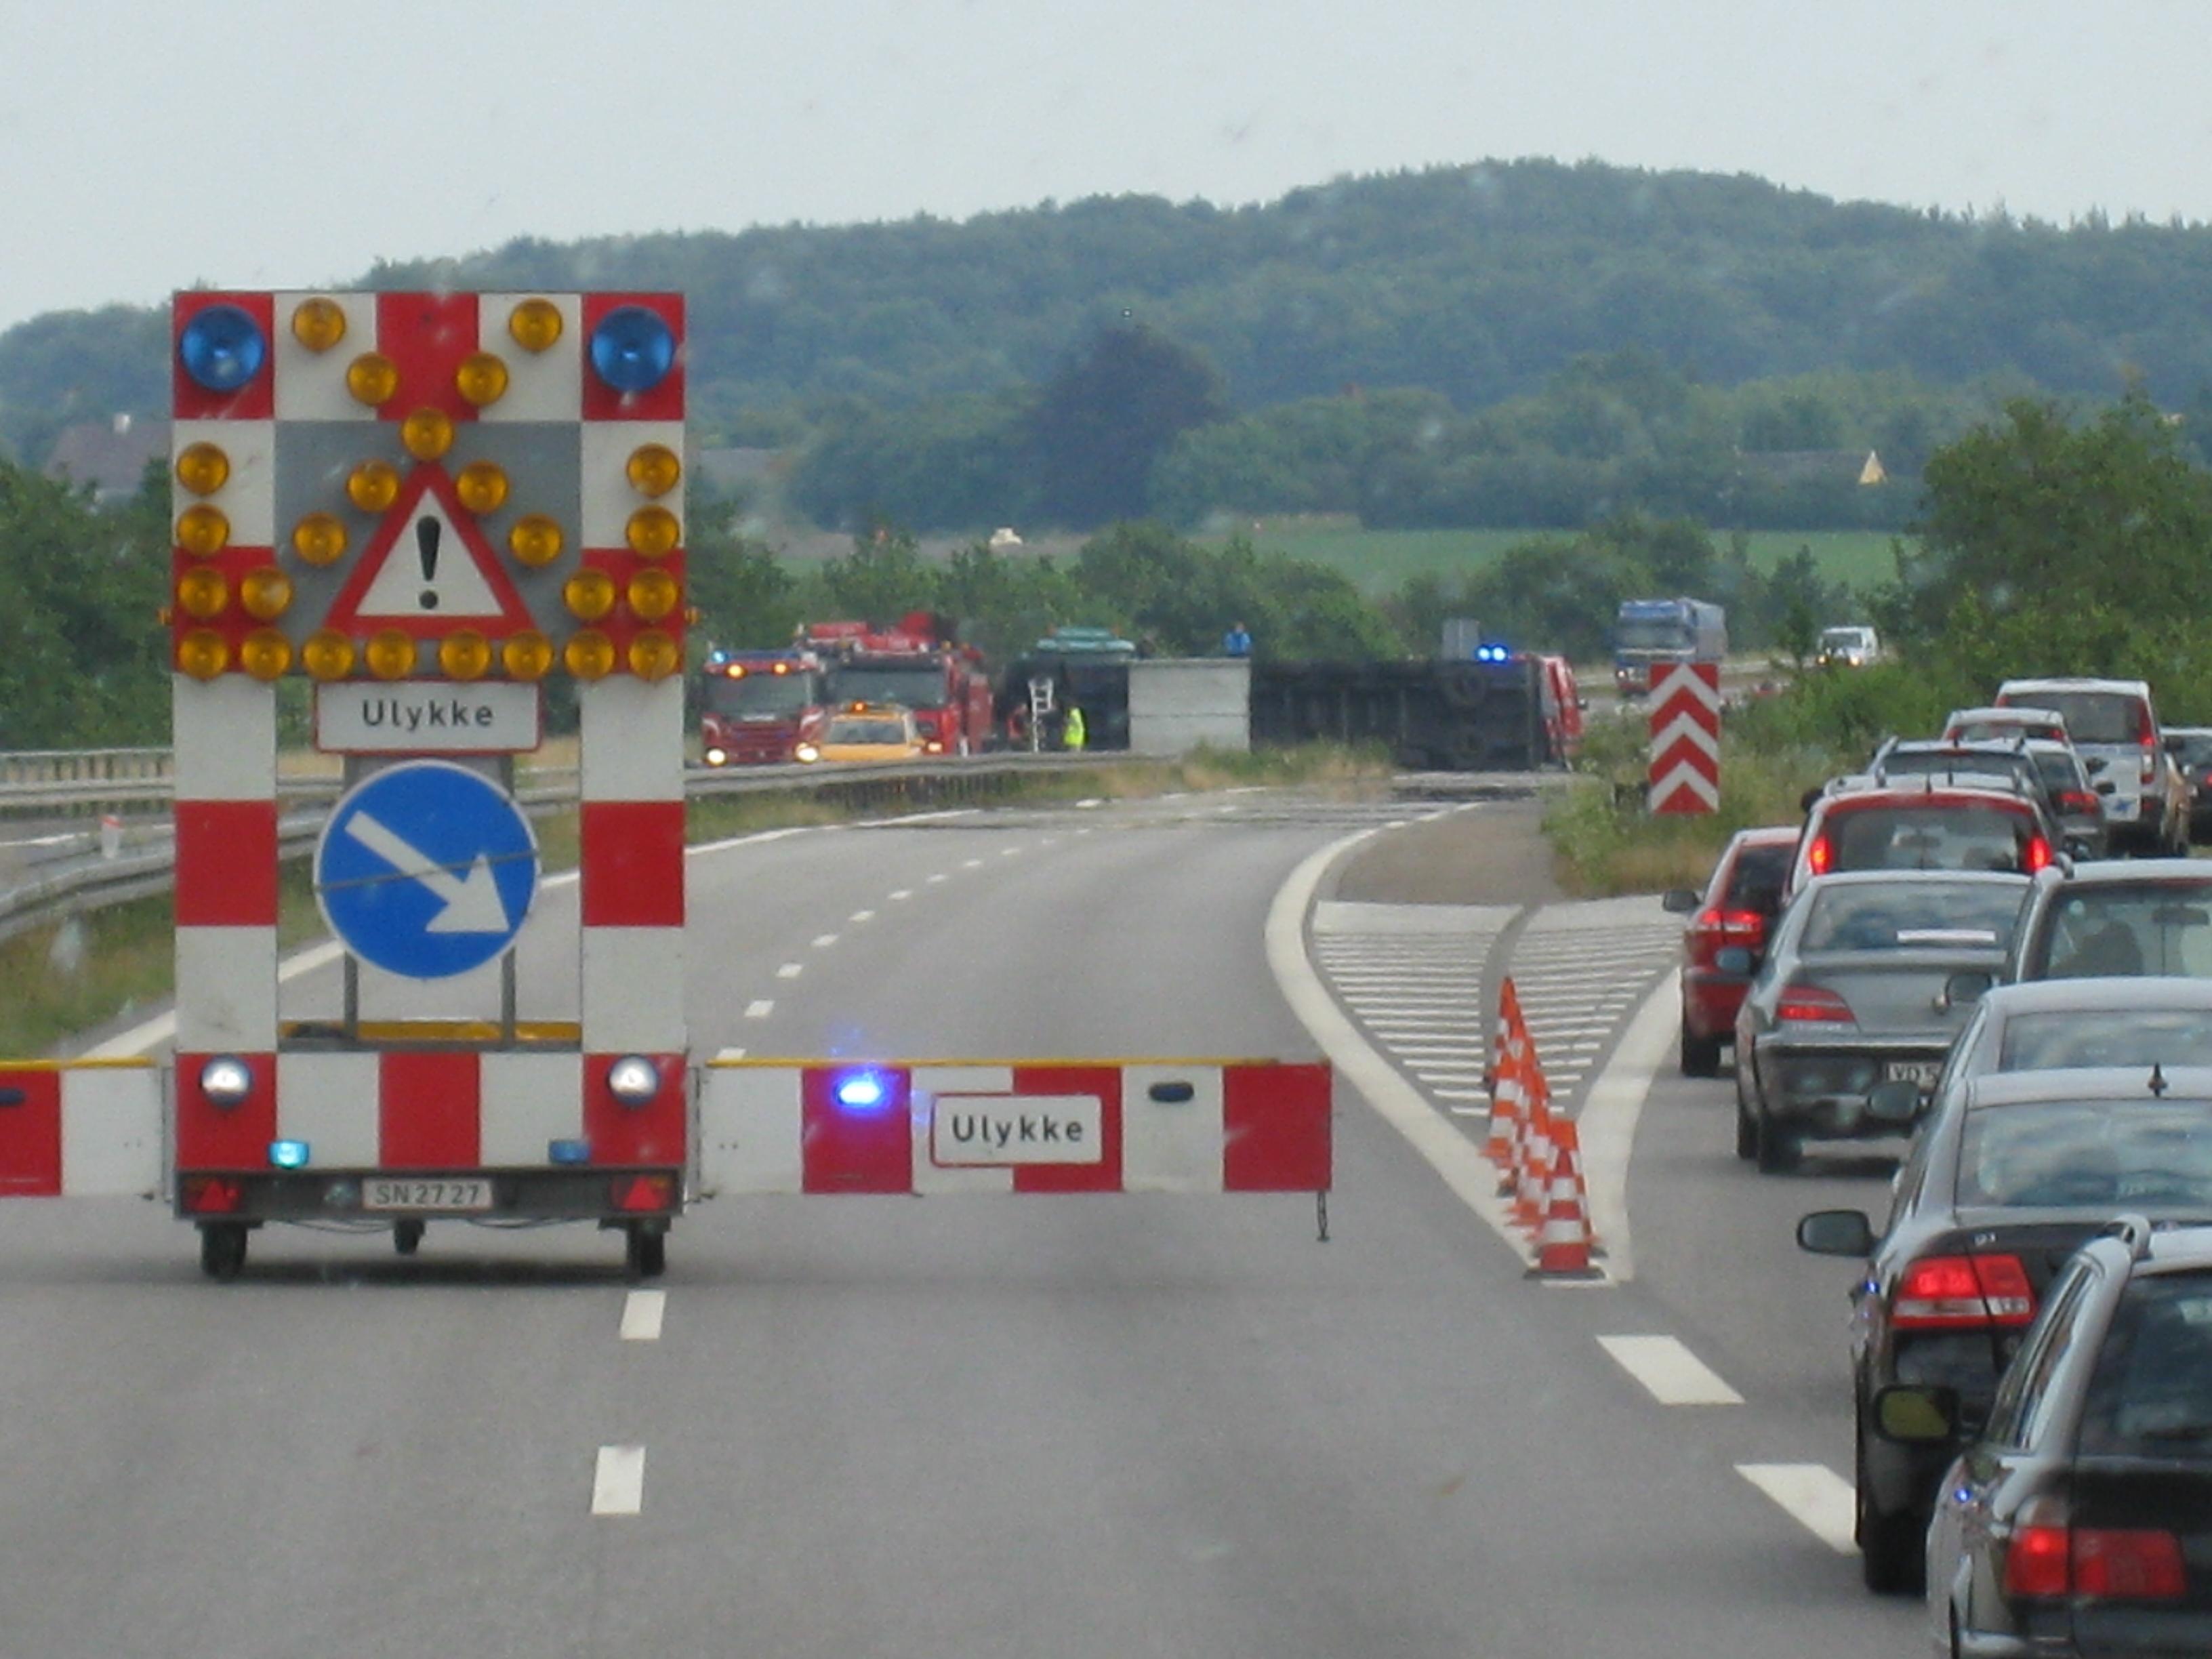 Traffic accident on a European highway. Image credit: flickr.com user Matti Mattila